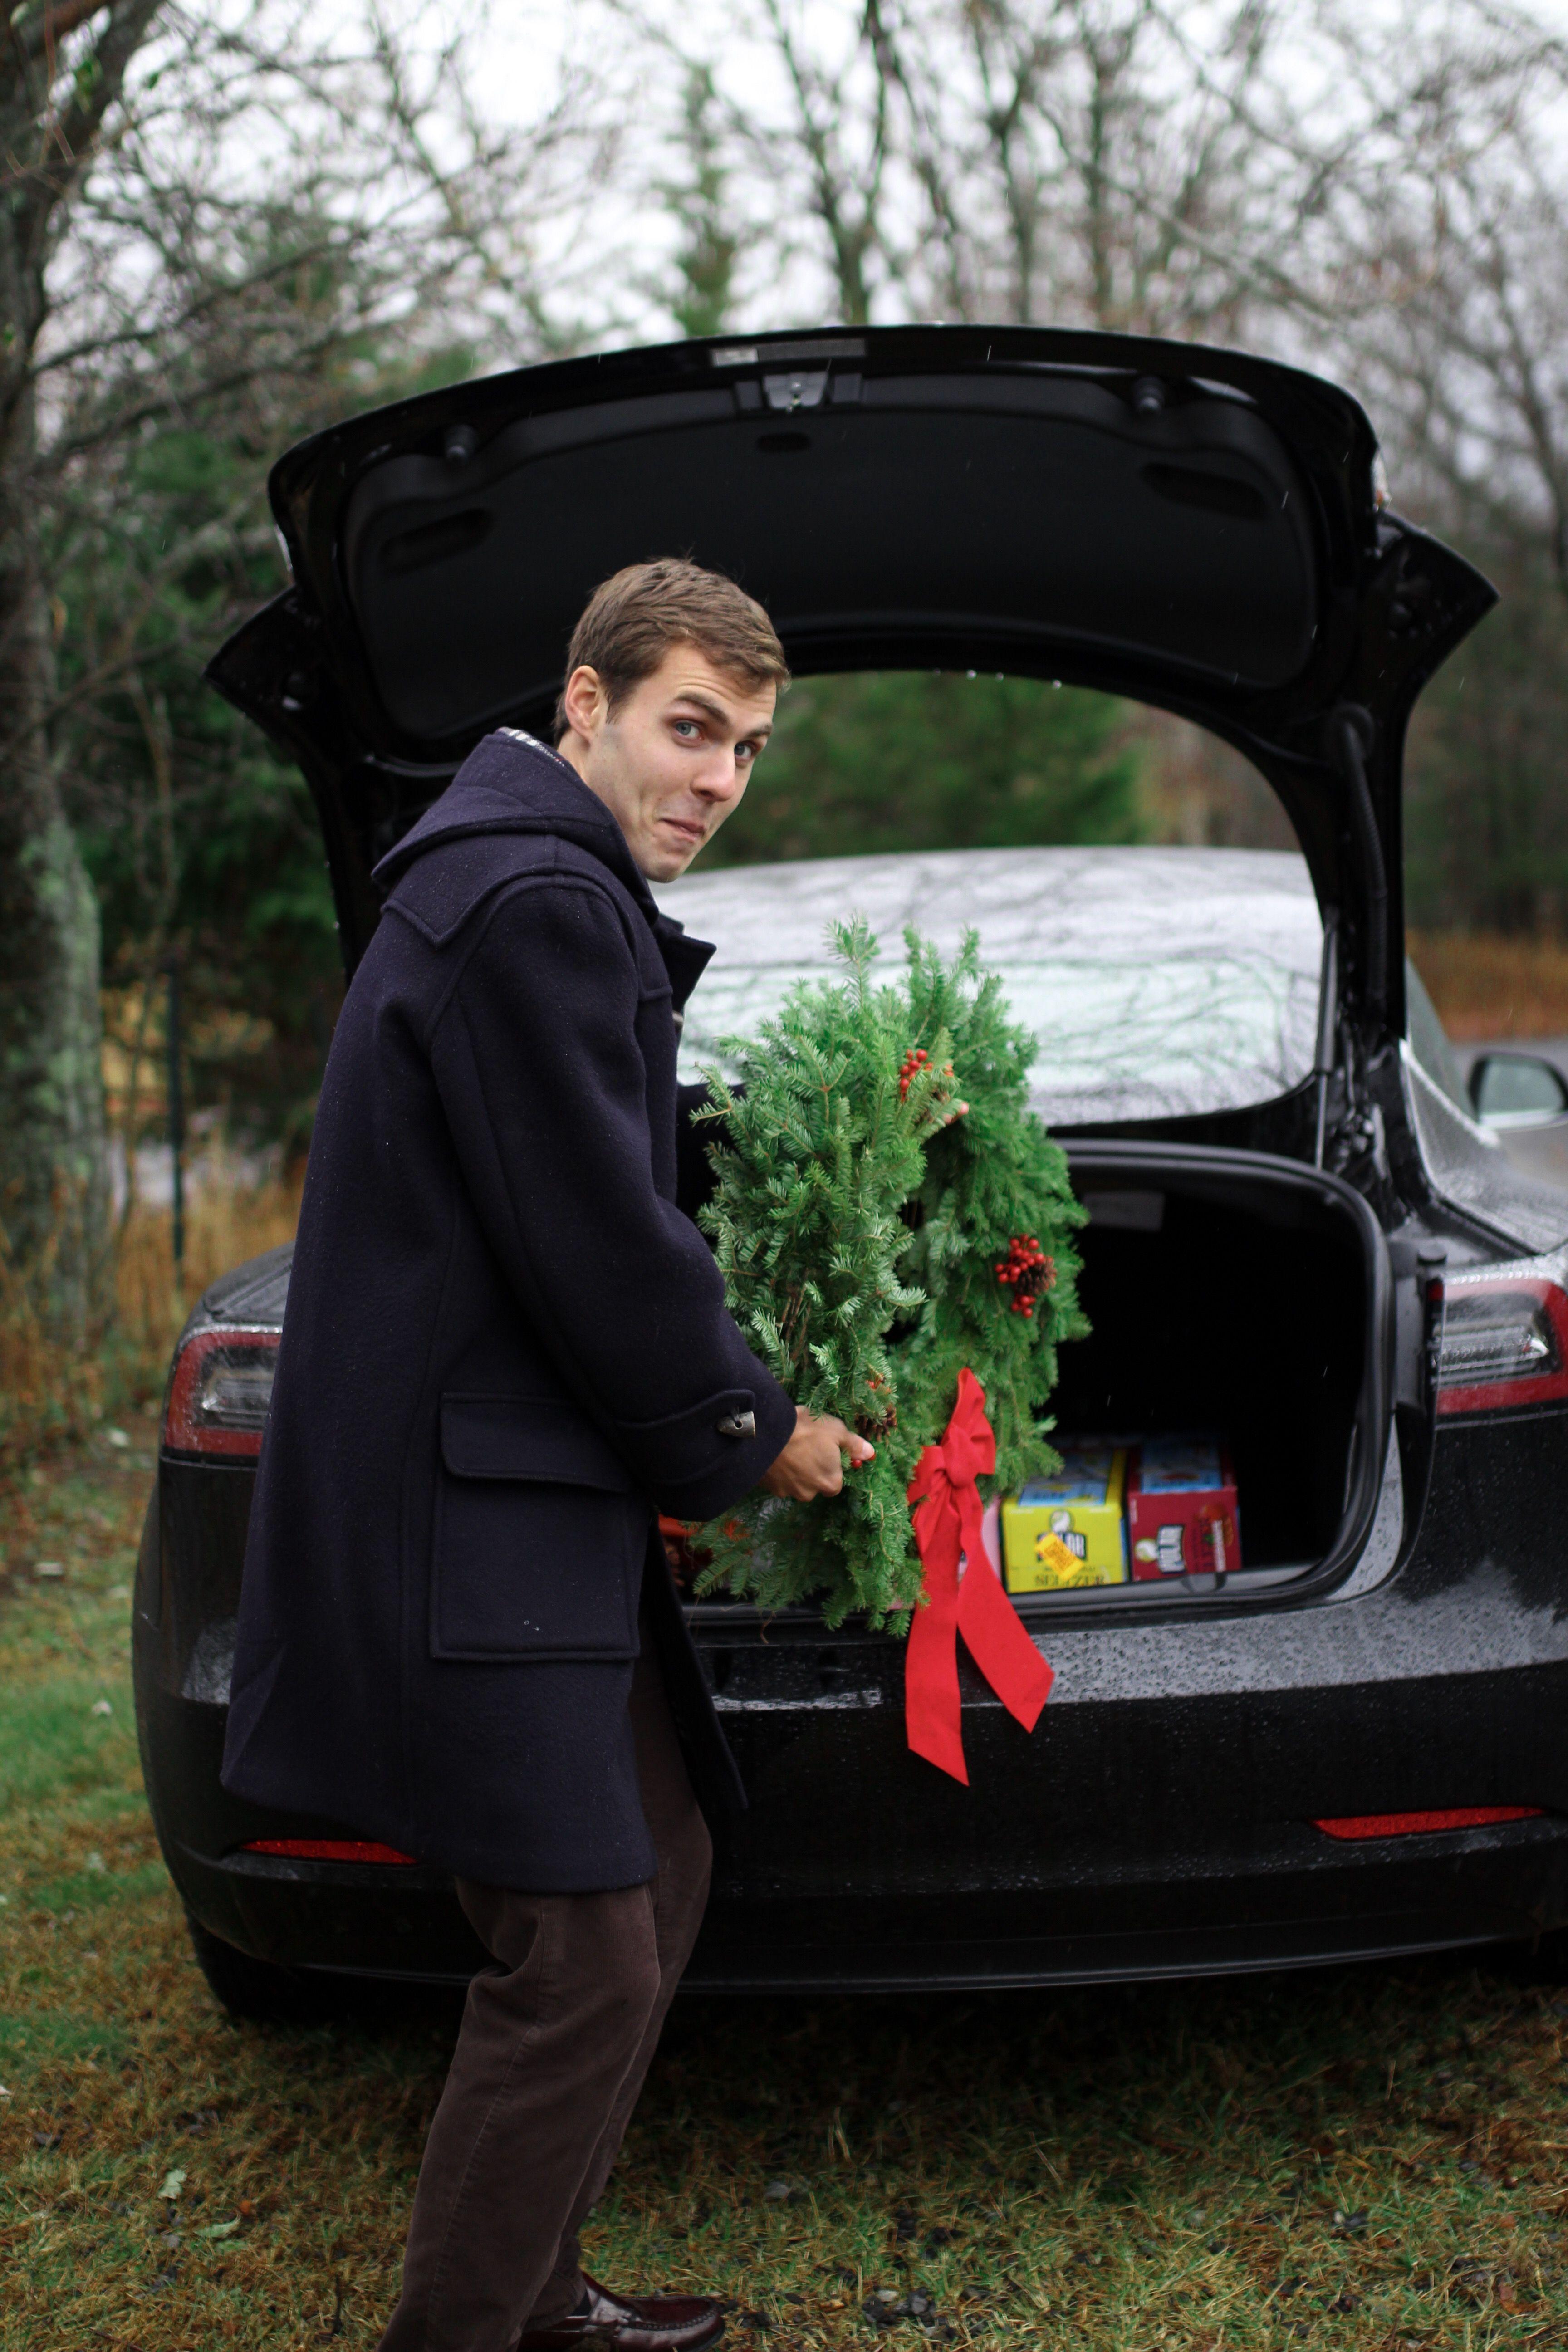 Fox Ridge Christmas Tree Farm - Take 7 #christmastreefarm #christmastree #visitnewyork #visitnyc #christmastime #nyctravel #winterwonderland #winterlove #christmasinnyc #nyclifestyle #nycbloggers #newyorkcouple #upperwestside #nycchristmas #holidayseason #tistheseason #nycbloggers #upperwestsiders #nyclove #freedomthinkers #teslamotors  #christmaslove #tesla #newyorknewyork